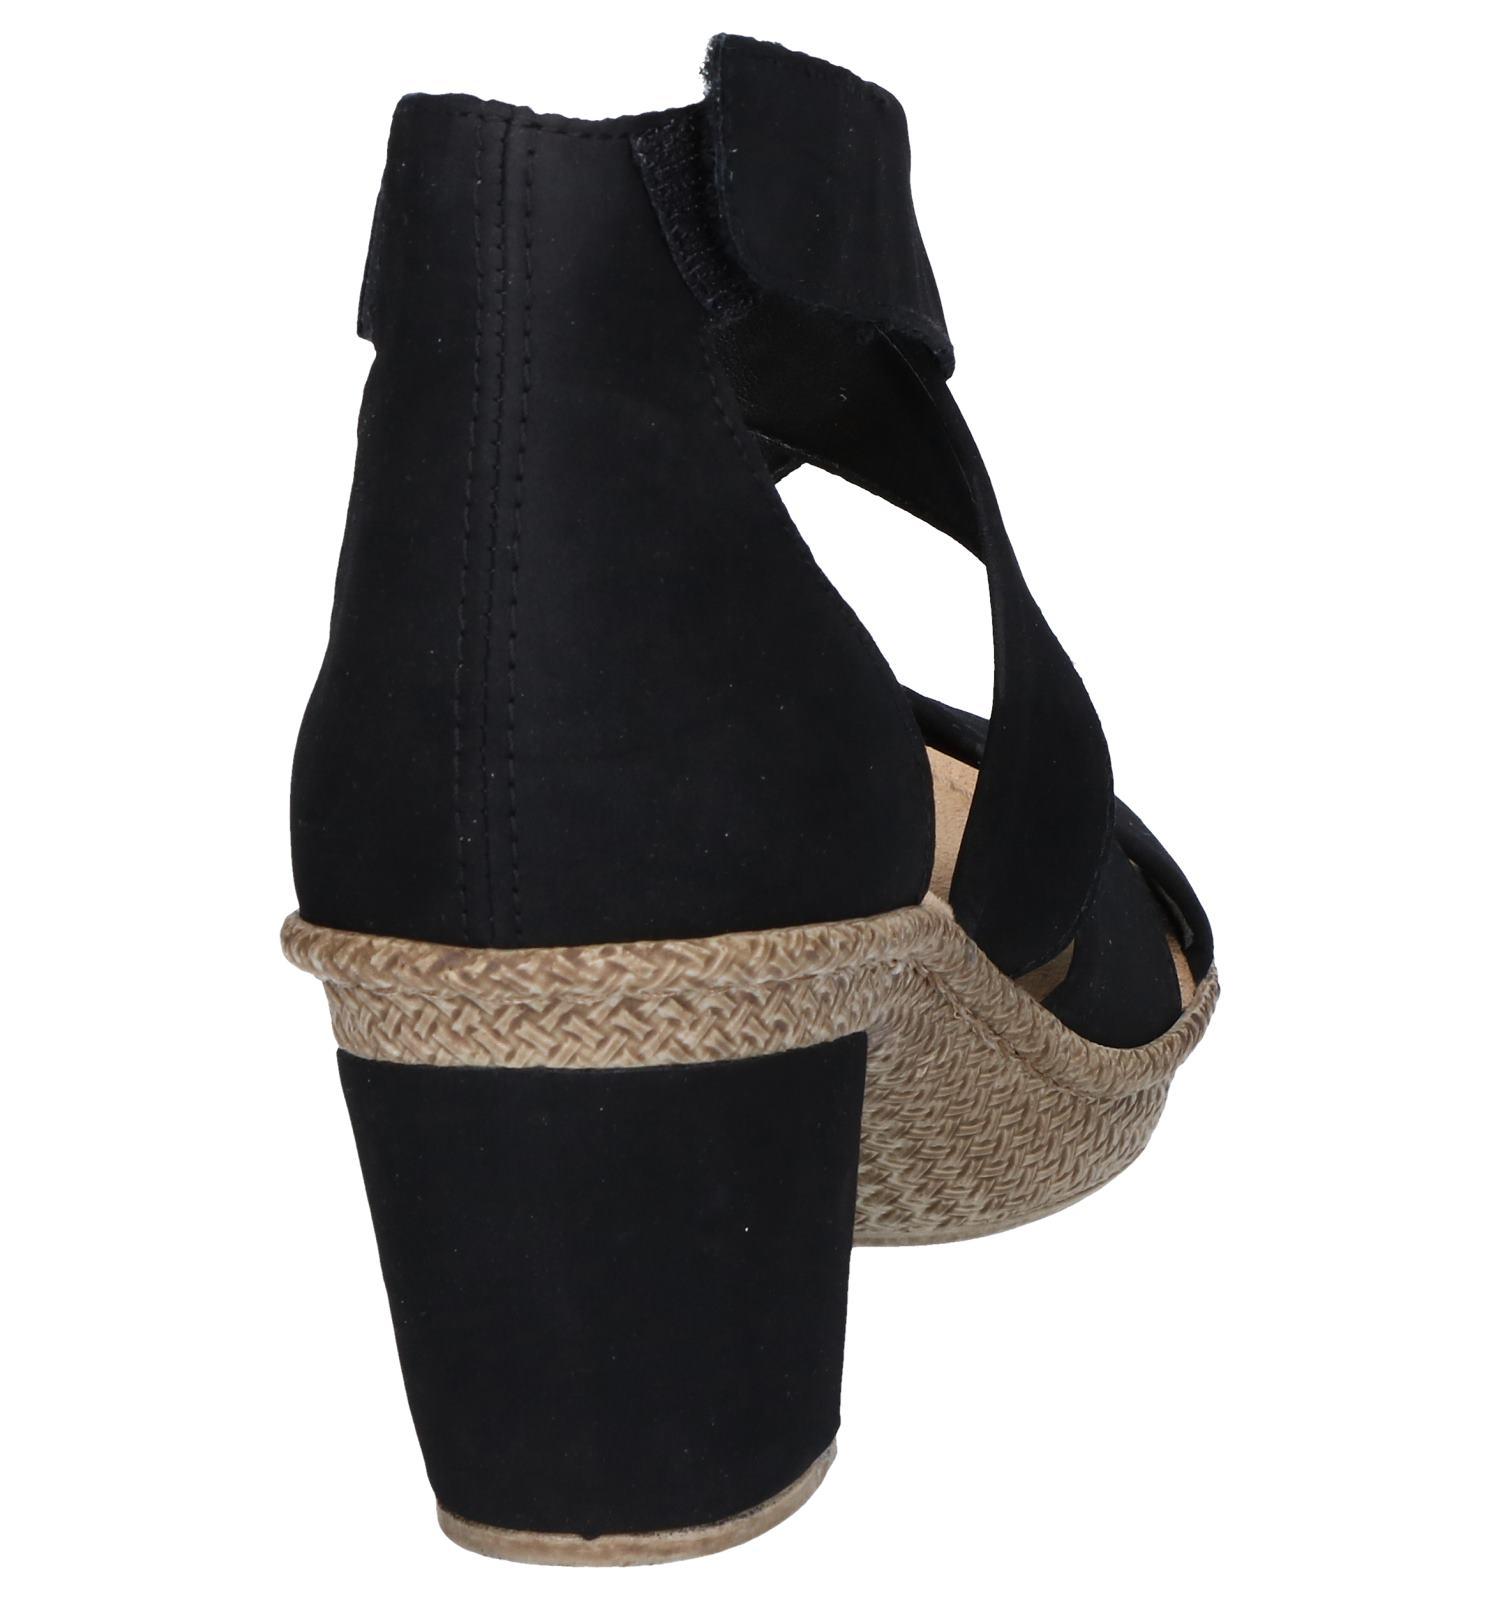 Sandalen Sandalen Rieker Zwarte Zwarte Sandalen Rieker Zwarte Rieker Zwarte AL3c5q4Rj